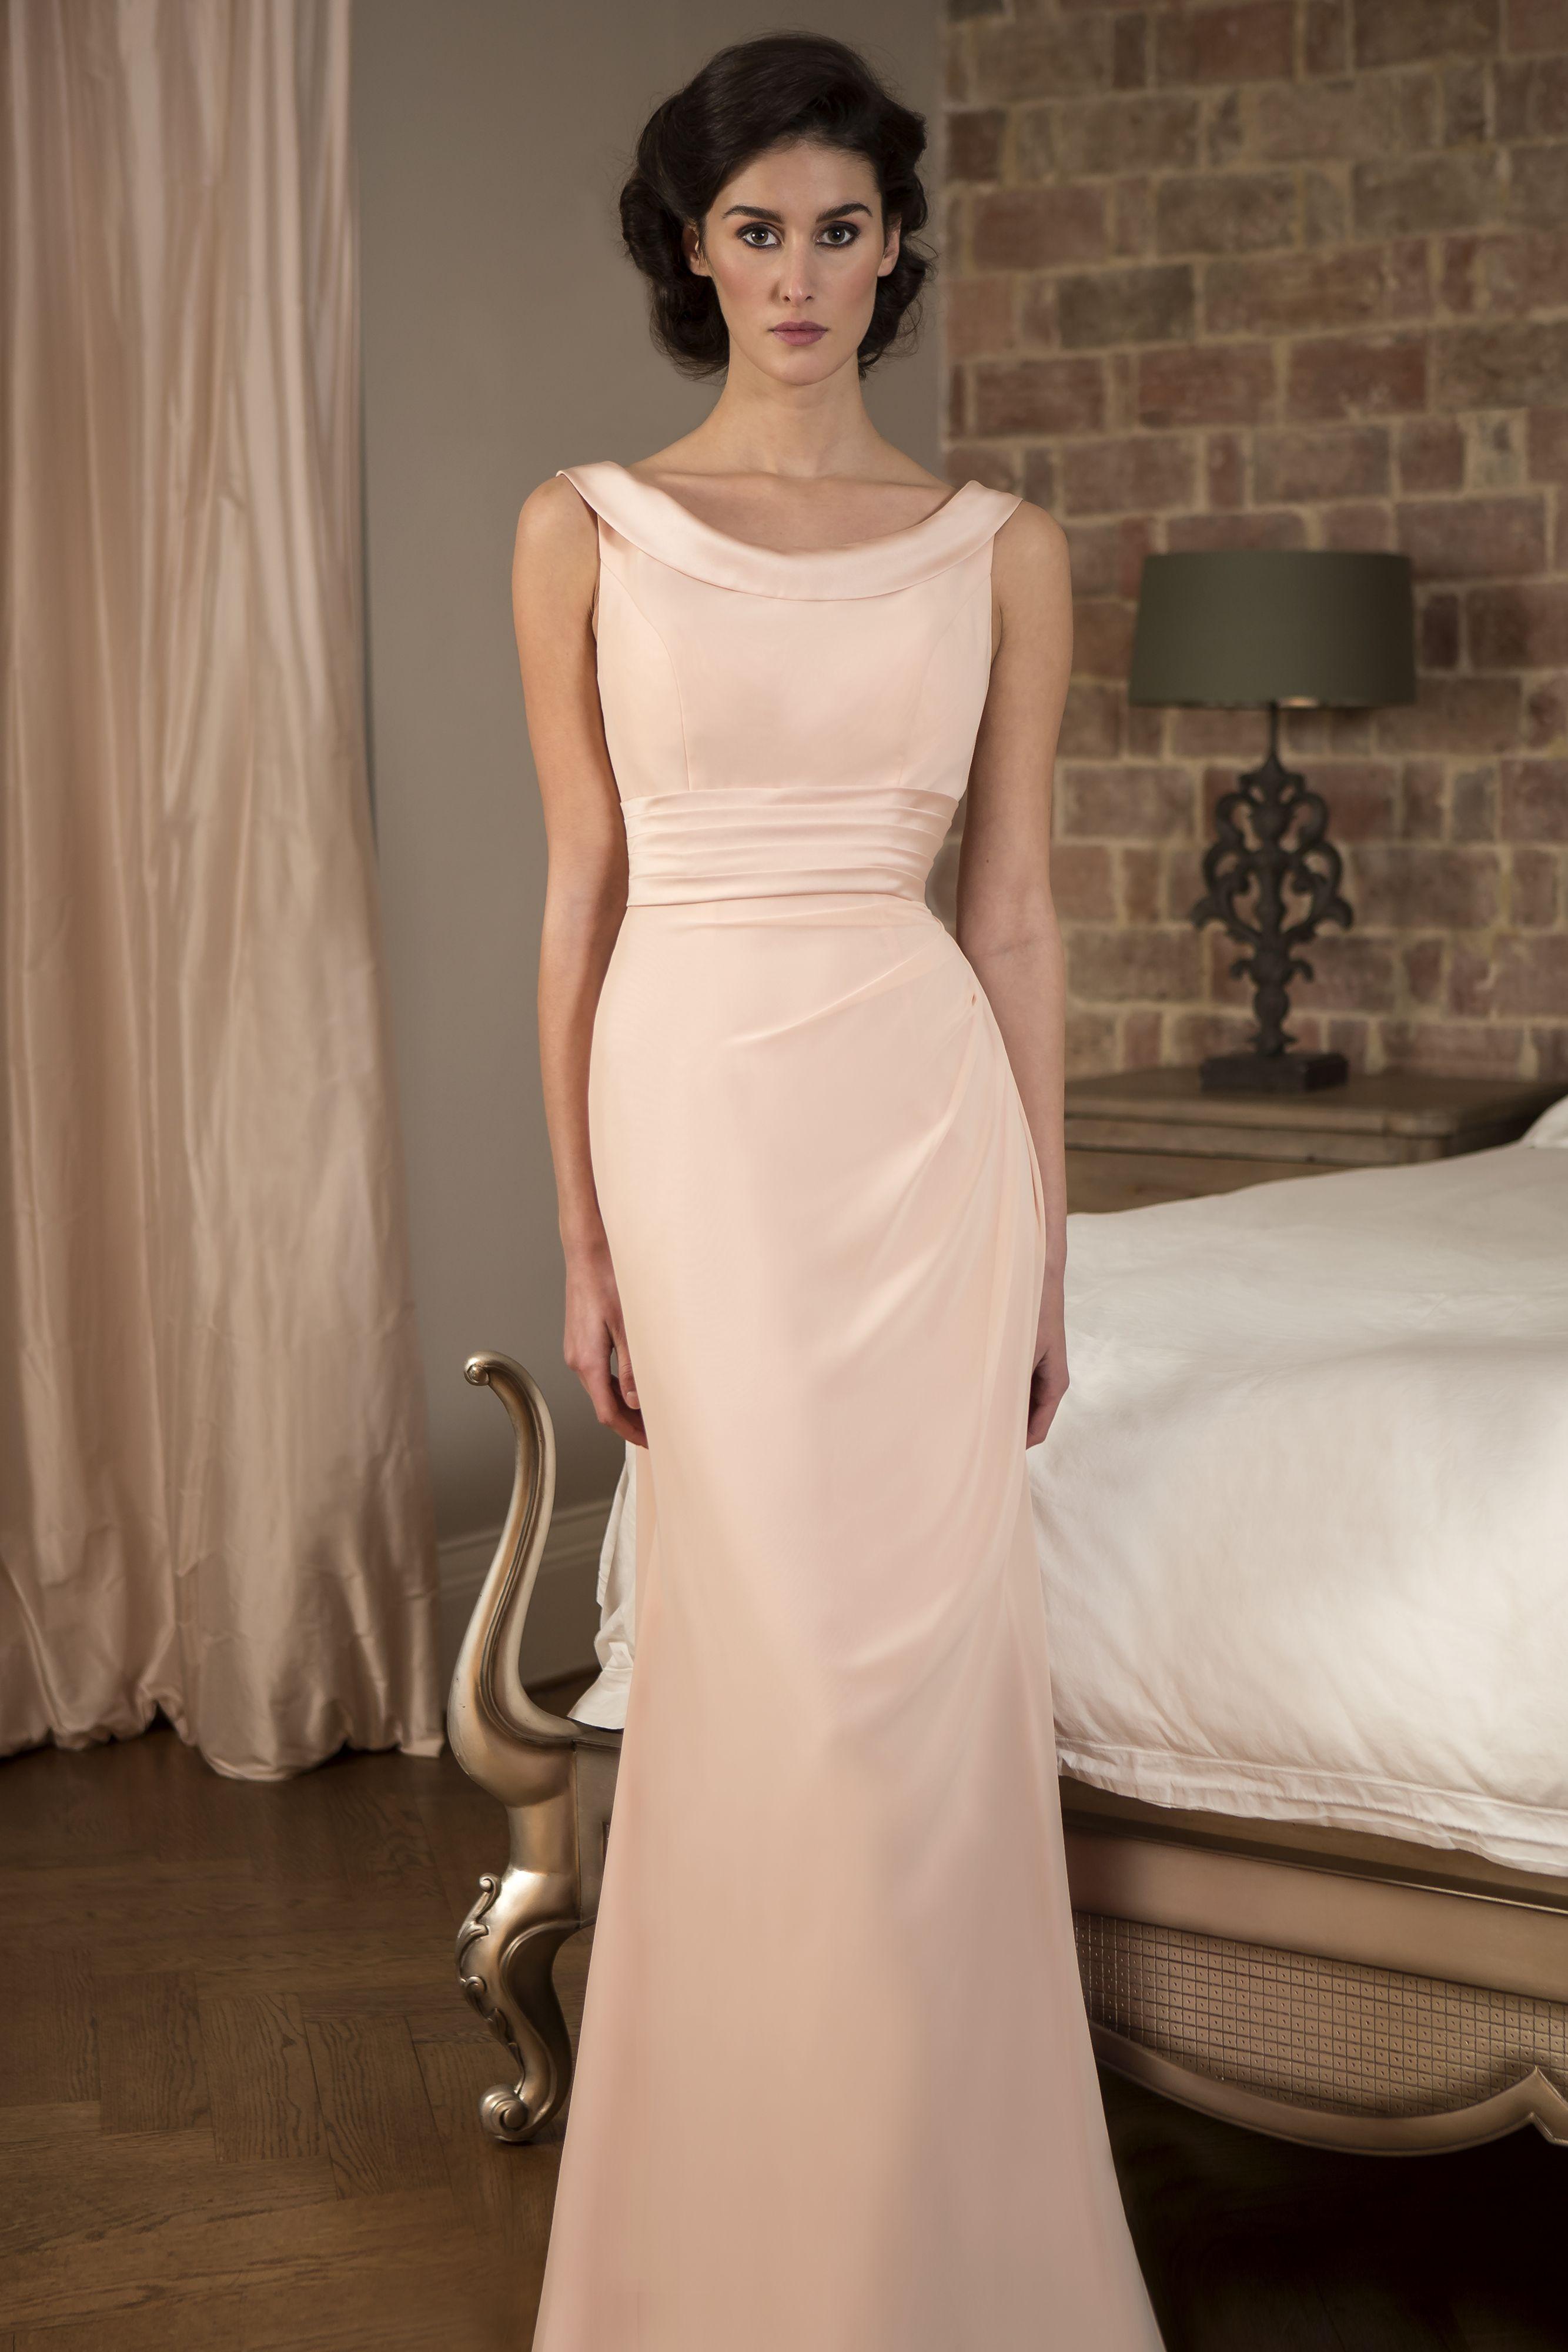 True Bridesmaid M582 Slim Chiffon Dress With Boat Neckline Satin Collar Pleated Waistband And Flattering Pleats To Hip